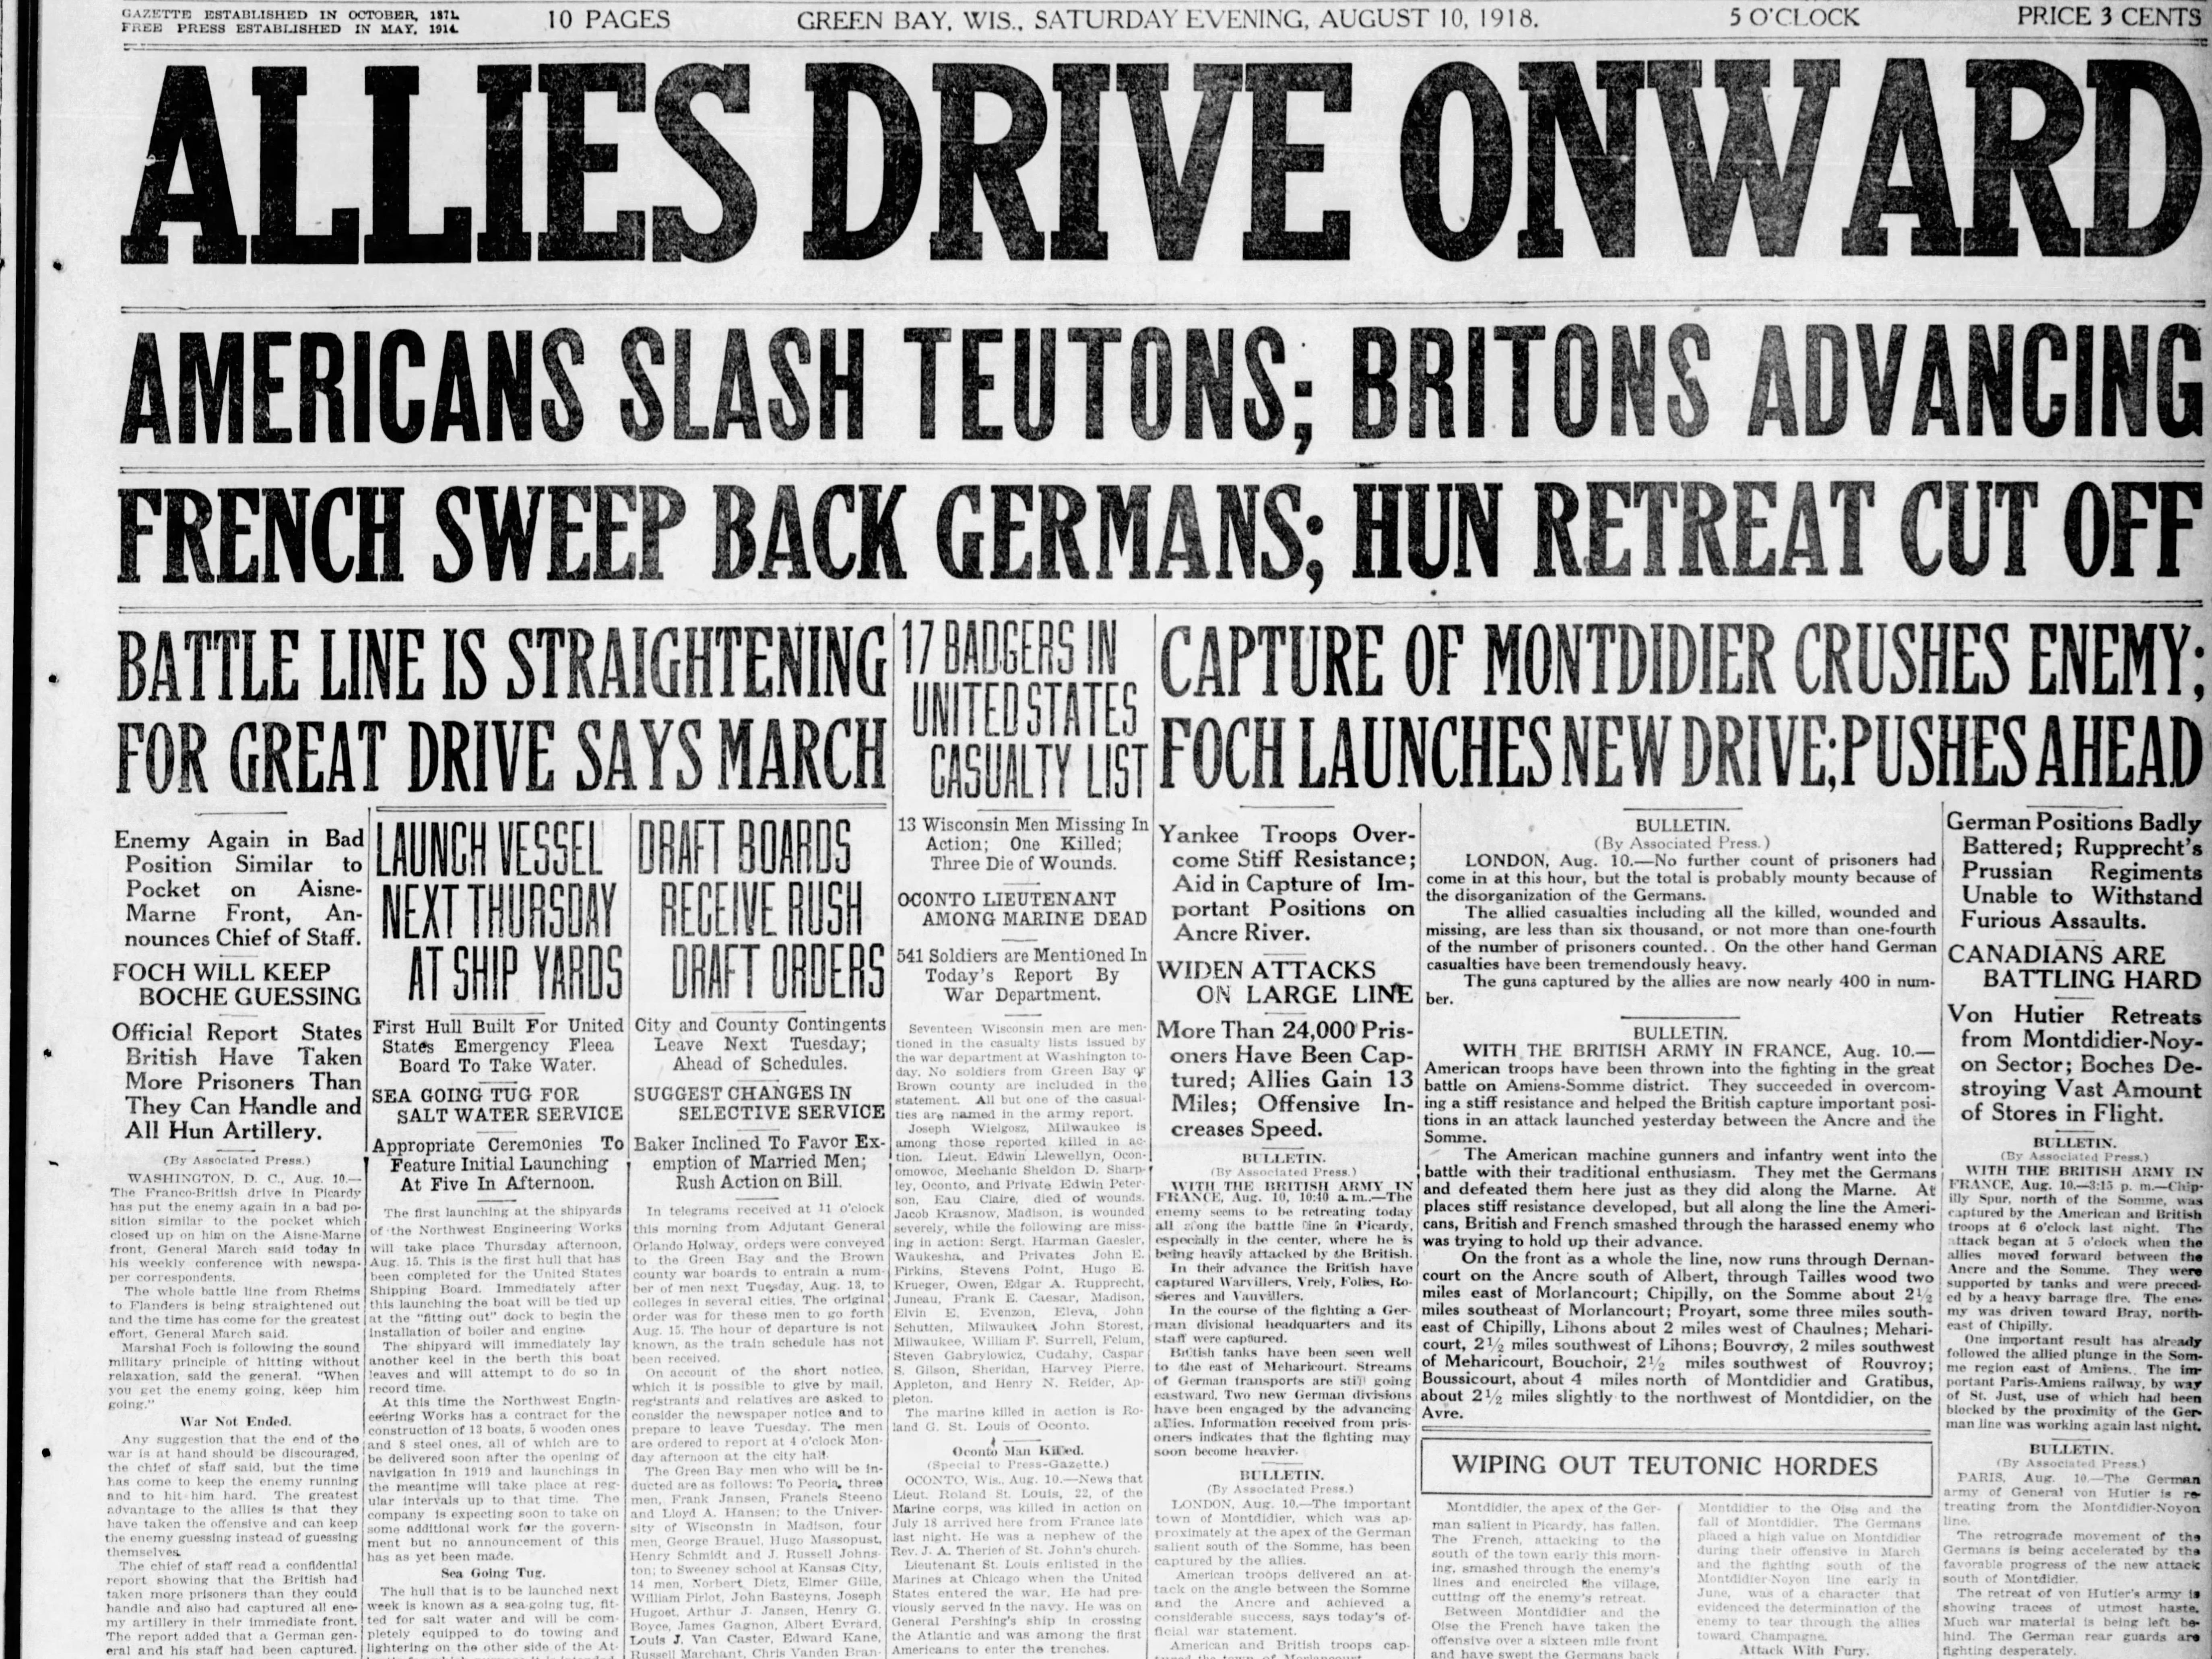 Aug. 10, 1918